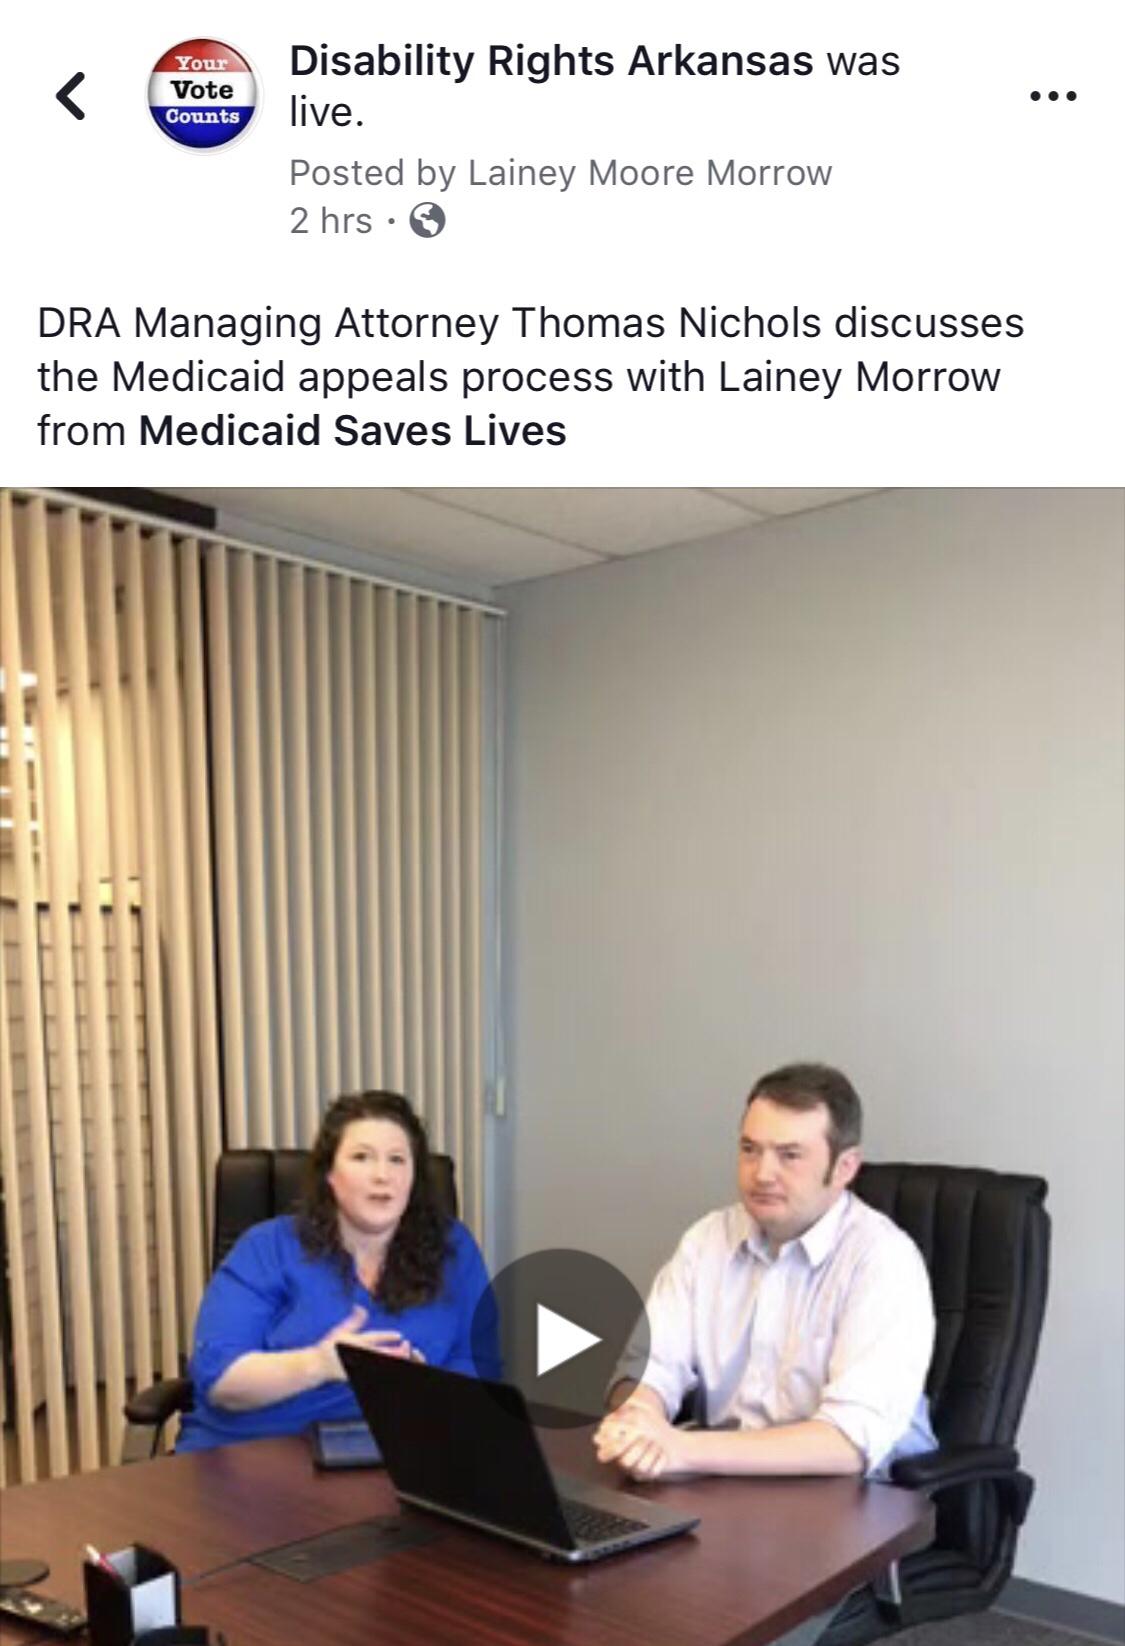 independent assessment – Medicaid Saves Lives